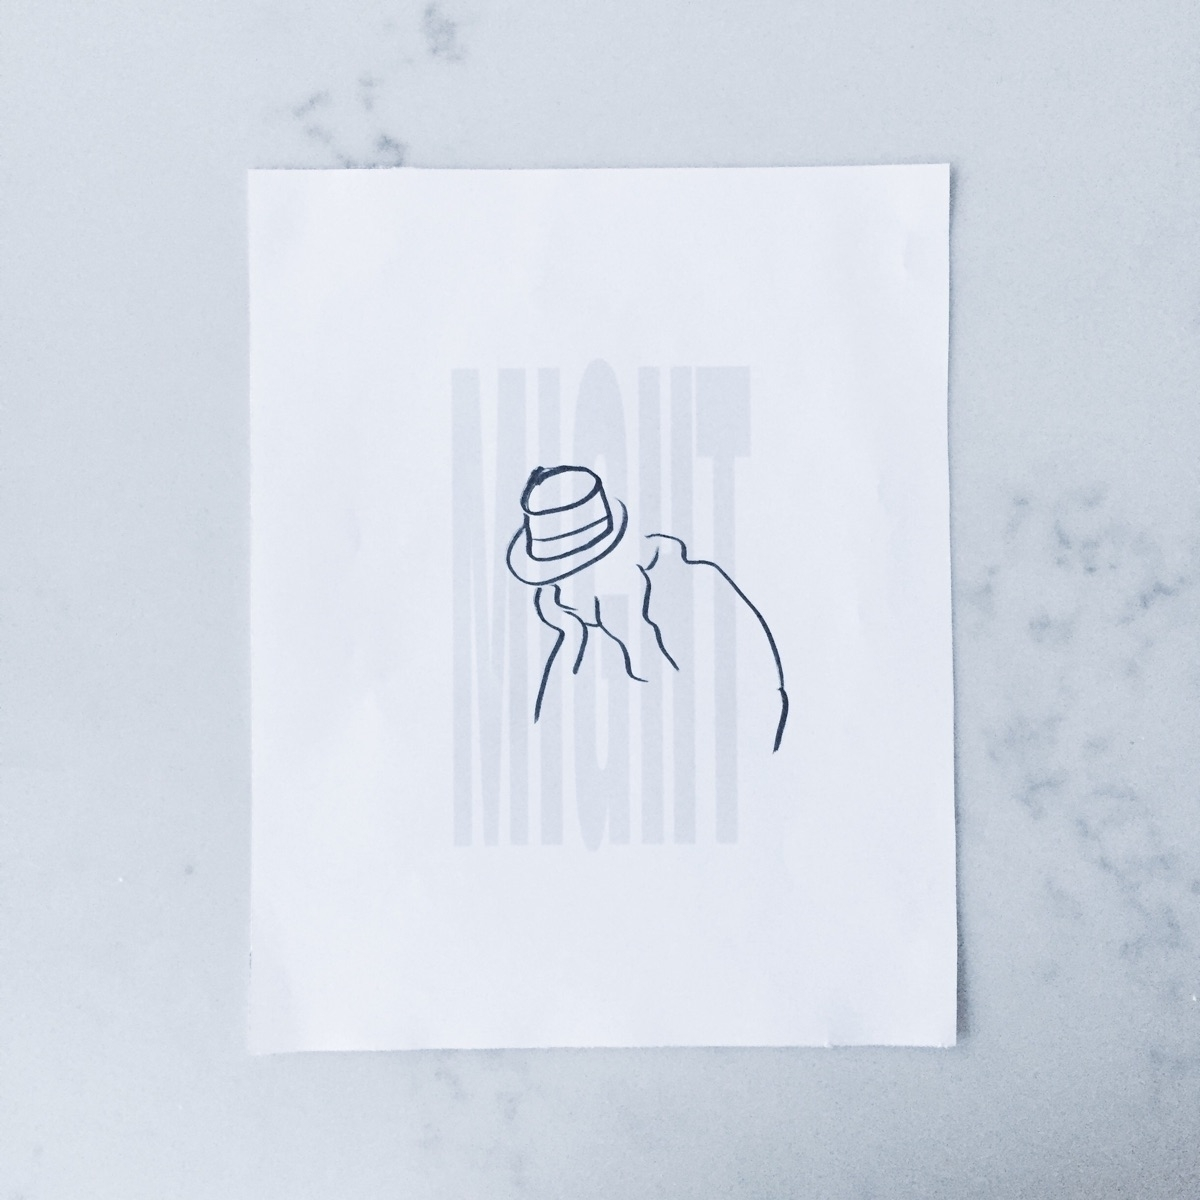 Gotta gotta — Collage 8x10 - deliboy | ello